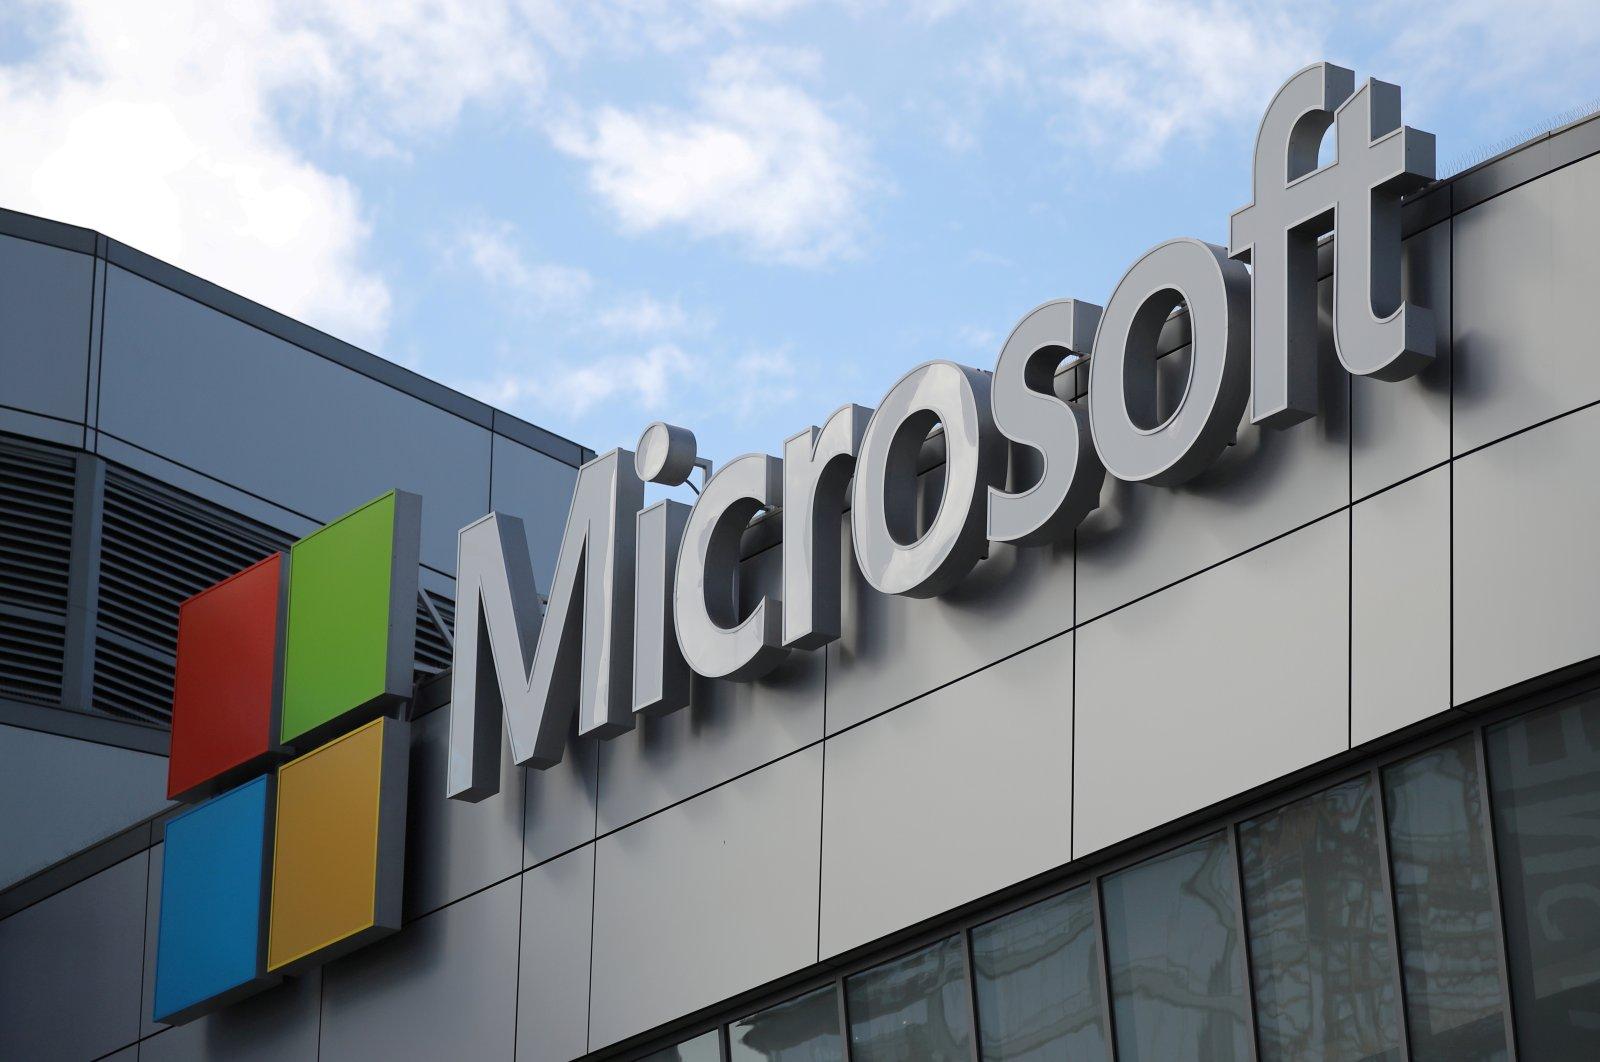 The Microsoft logo is seen in Los Angeles, California, U.S., Nov. 7, 2017. (Reuters Photo)